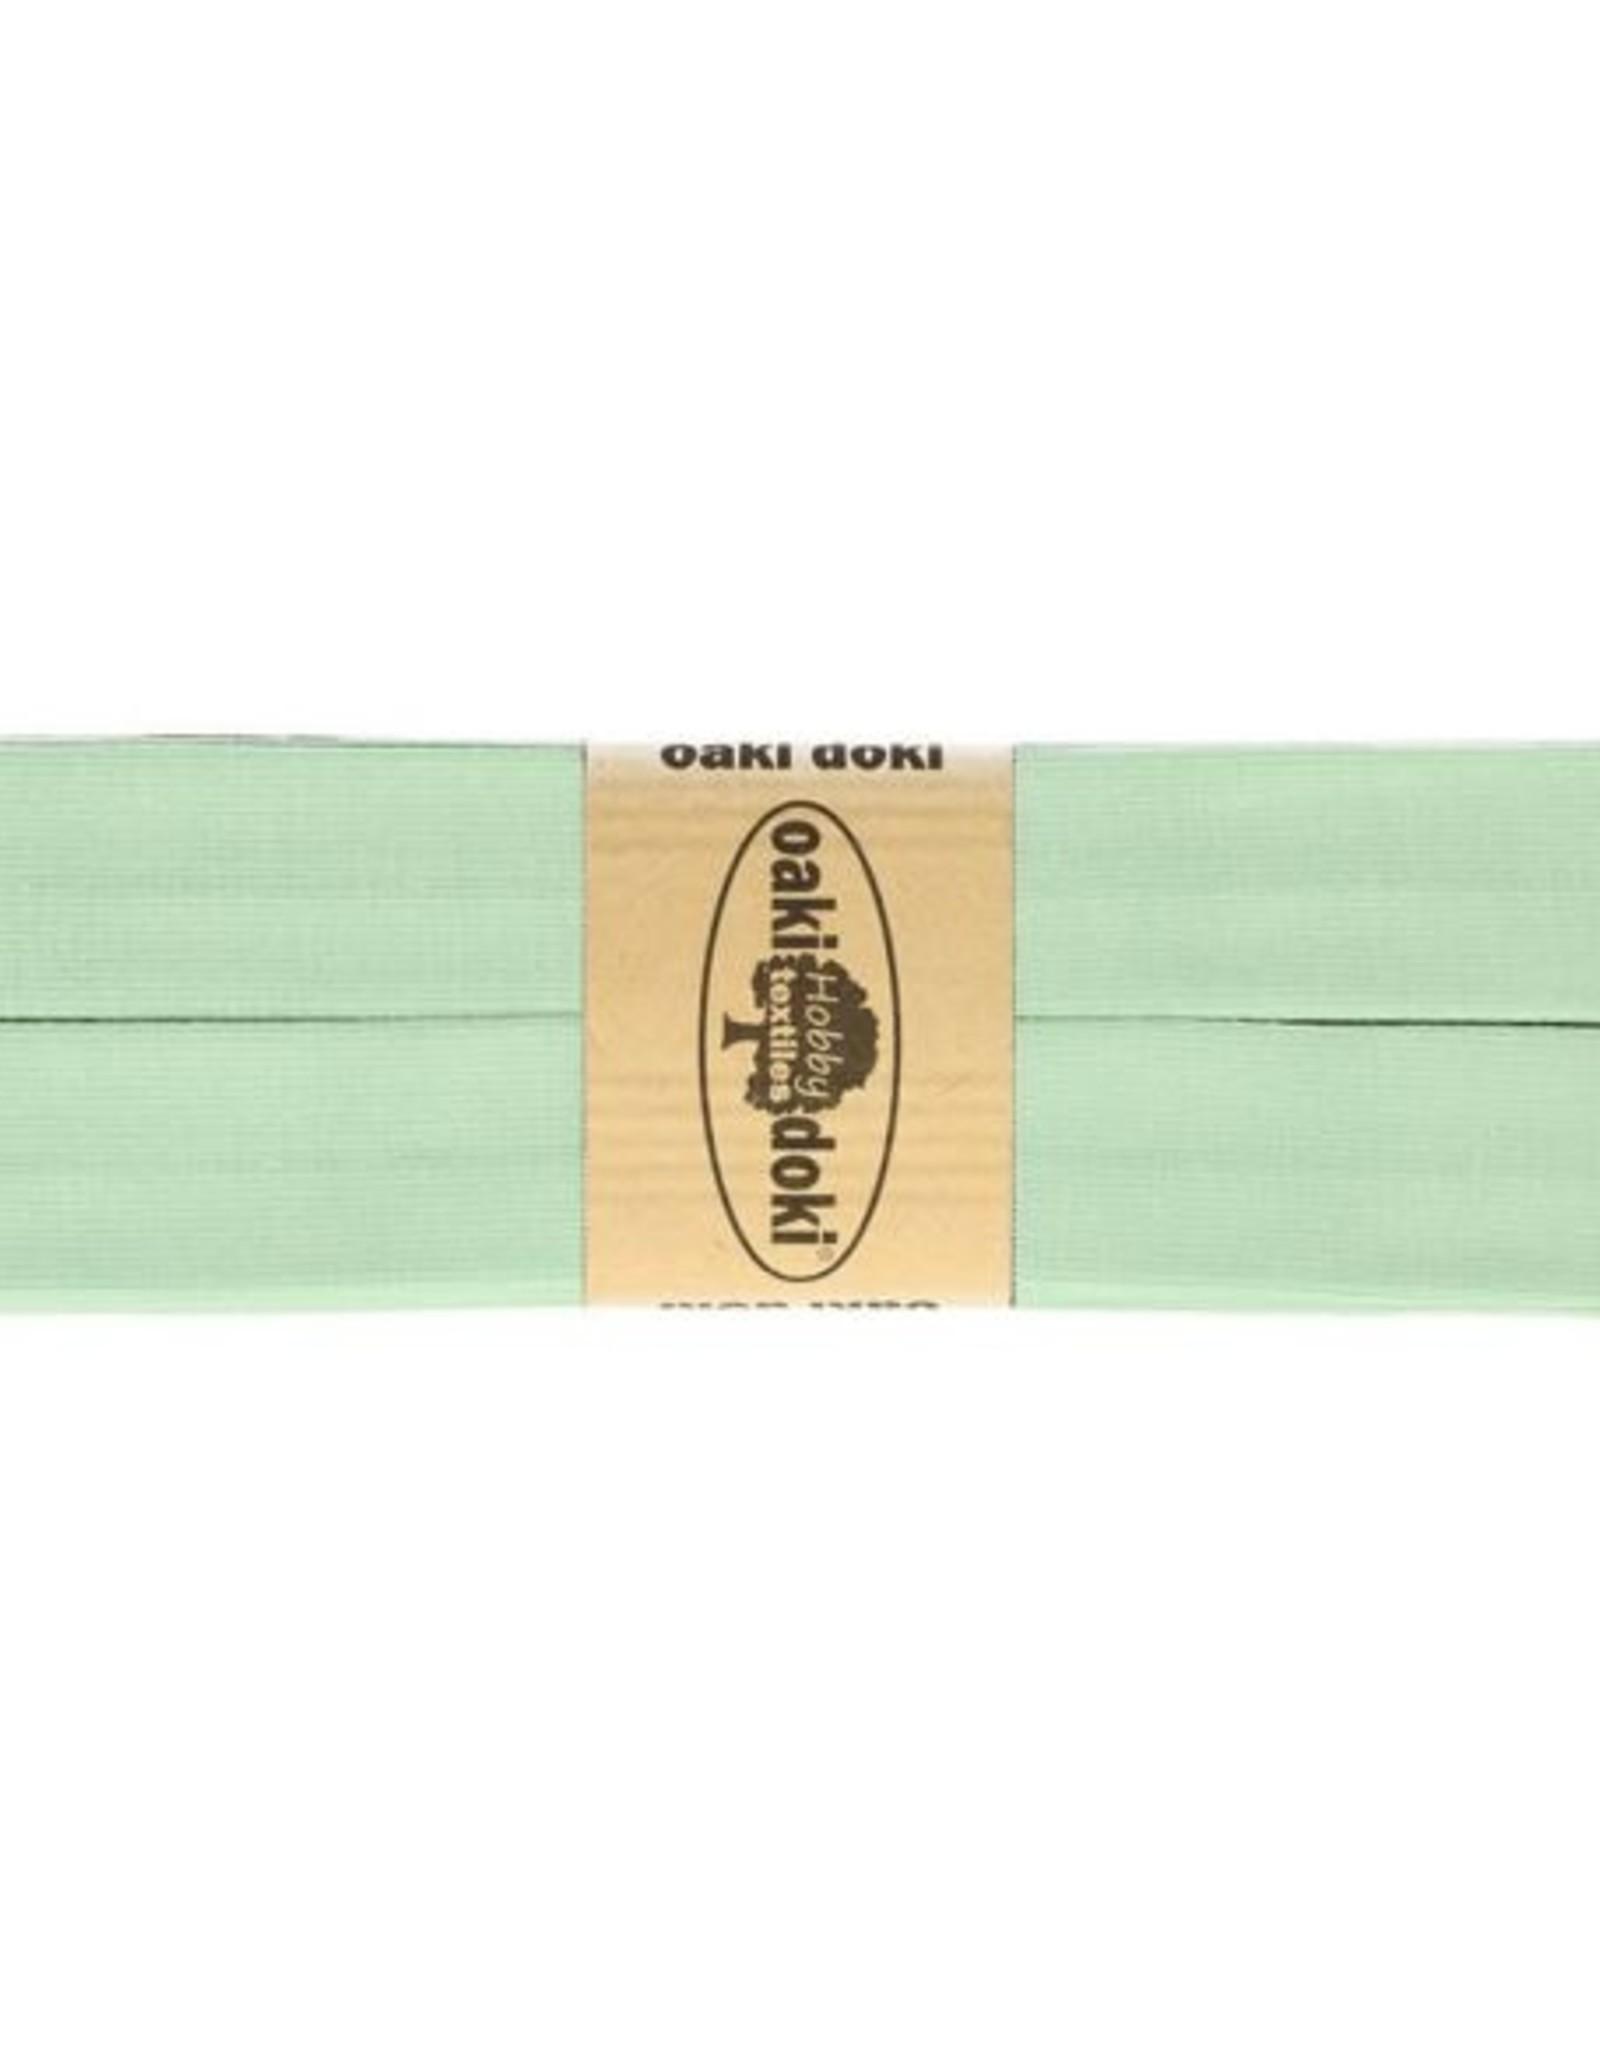 Oaki Doki Tricot de luxe jersey biaisband 20mm x 3m 025